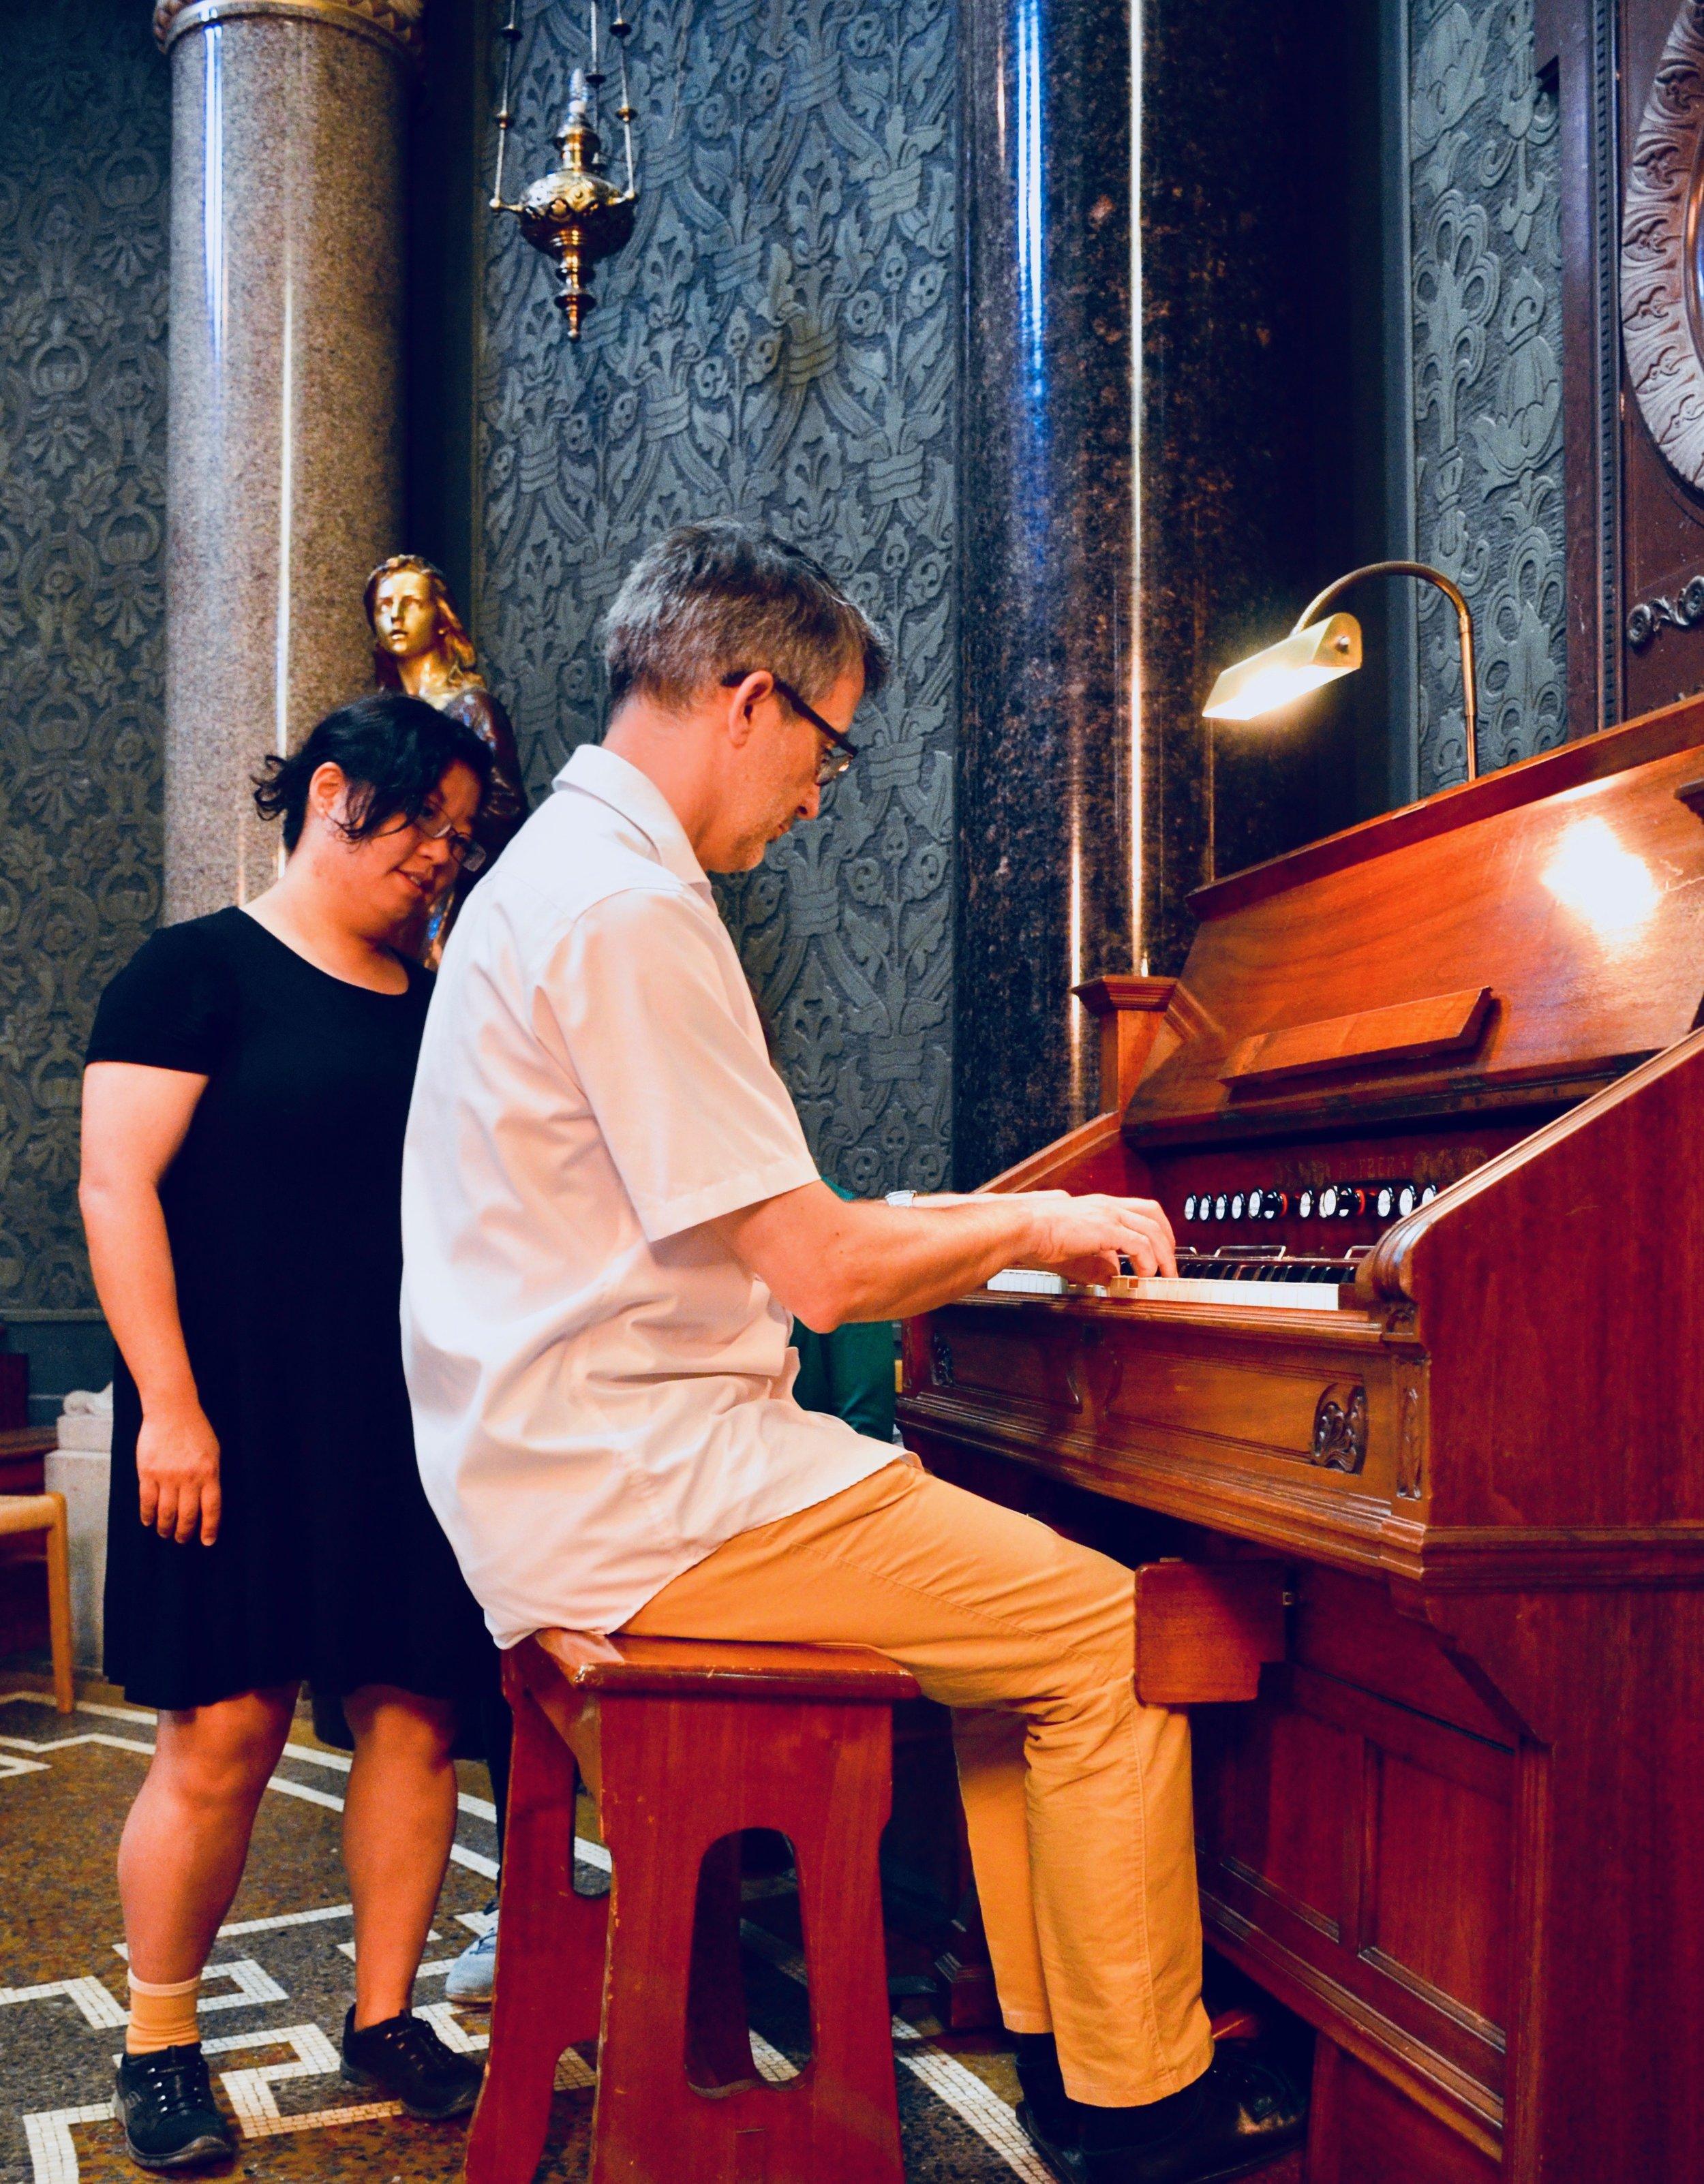 Sven Verner Olsen demonstrates one of Jesuskirke's many harmoniums.